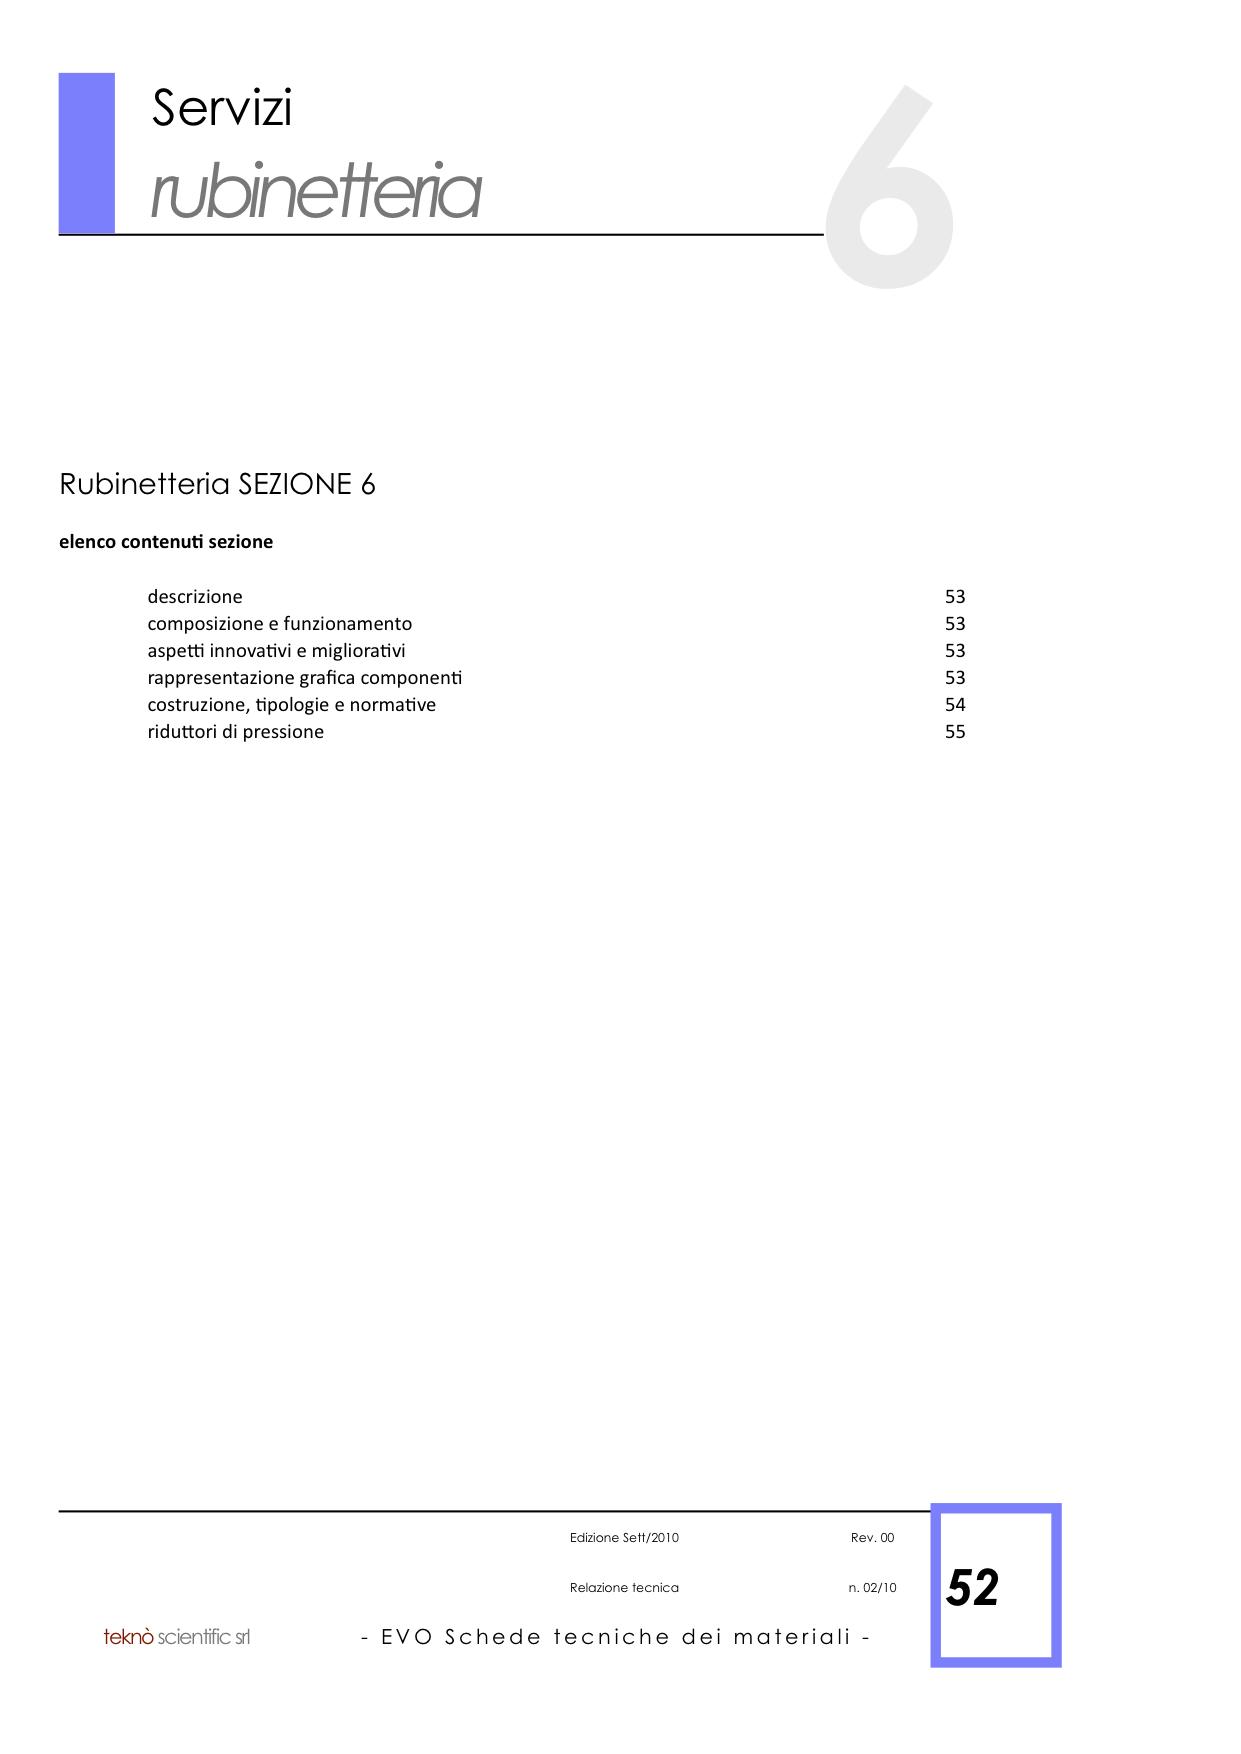 EVO Schede Tecniche materiali copia 13.png